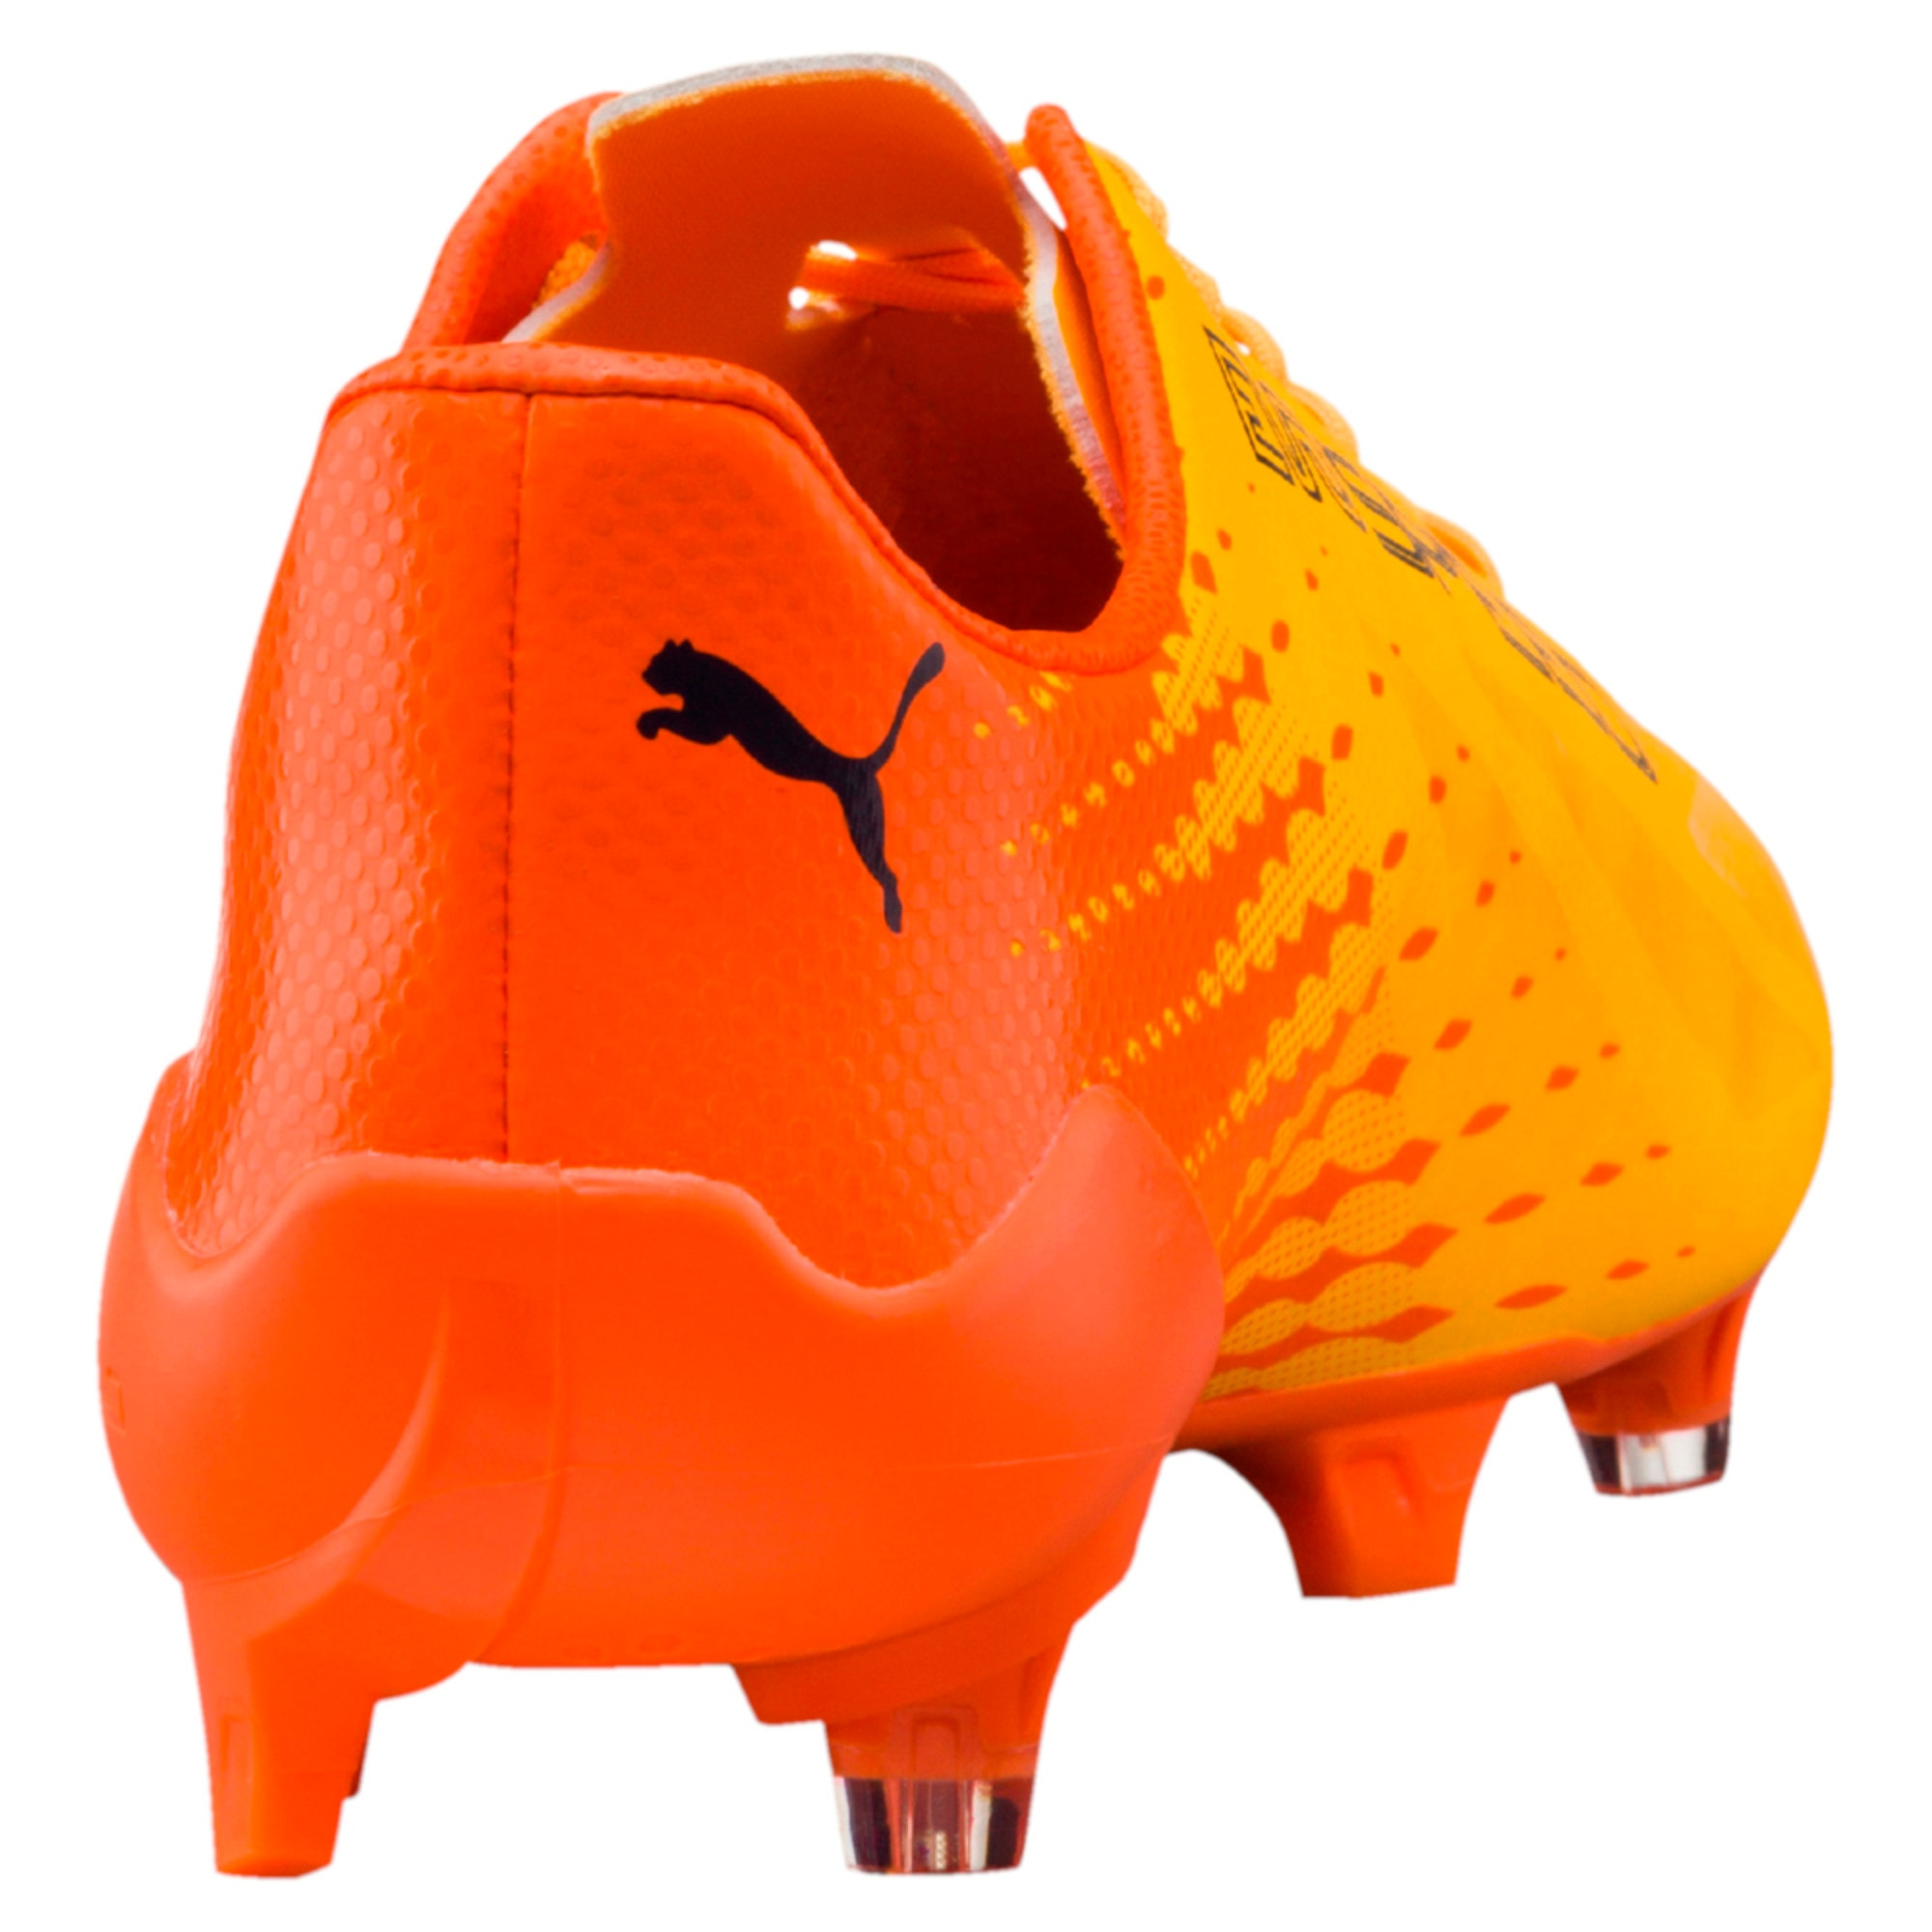 Thumbnail 3 of evoSPEED 17 SL-S FG Men's Football Boots, YELLOW-Peacoat-Orange, medium-IND